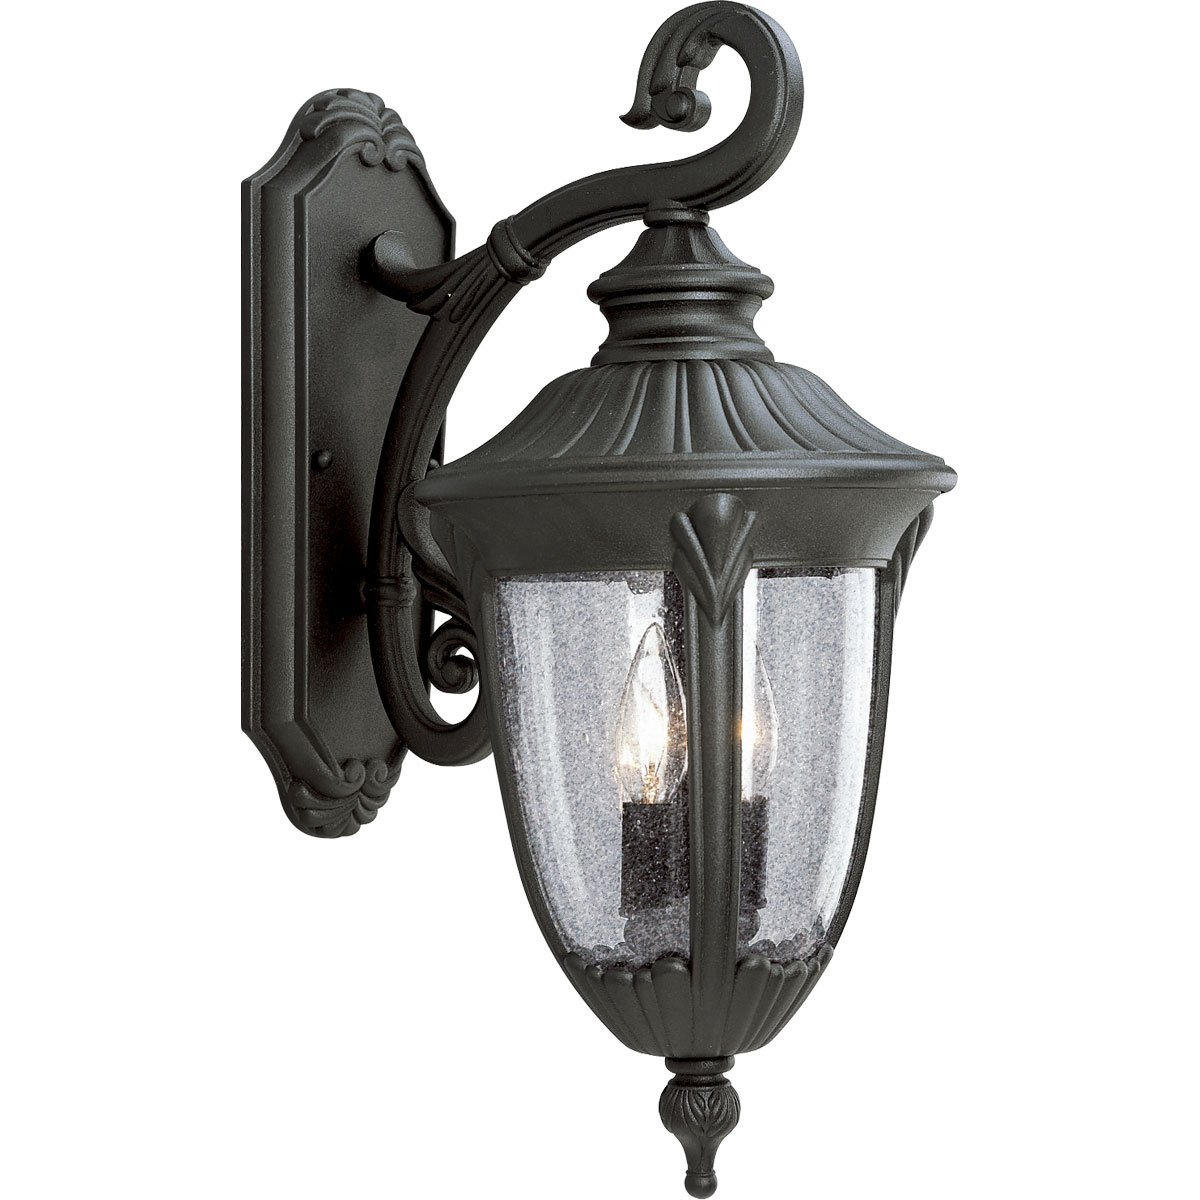 Progress Lighting P5822-31 Cast Aluminum Wall Lantern with Clear Seeded Glass, Textured Black by Progress Lighting B0013CCNZ4